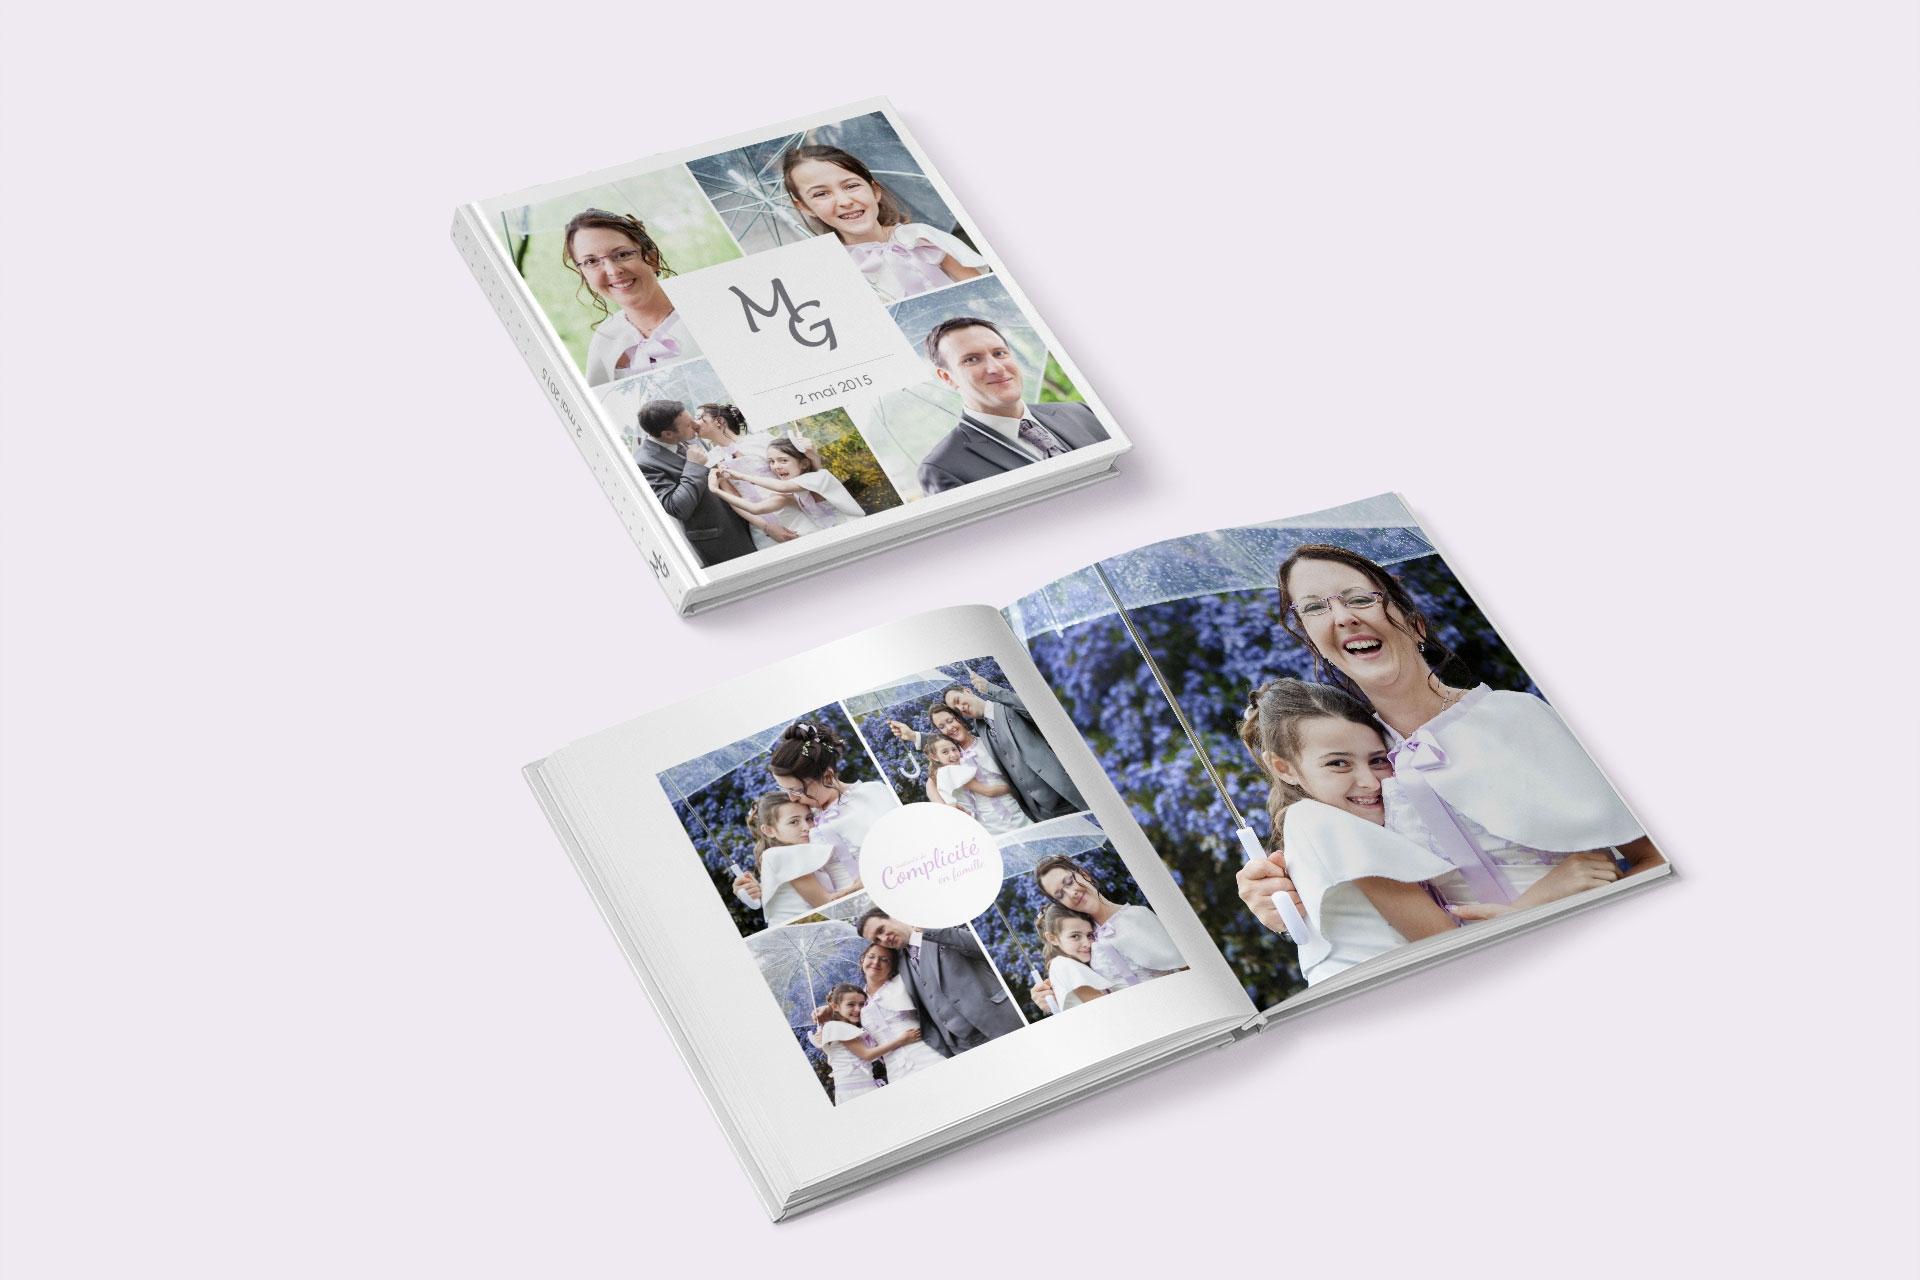 particuliers-creas-album-photo-magali&guillaume